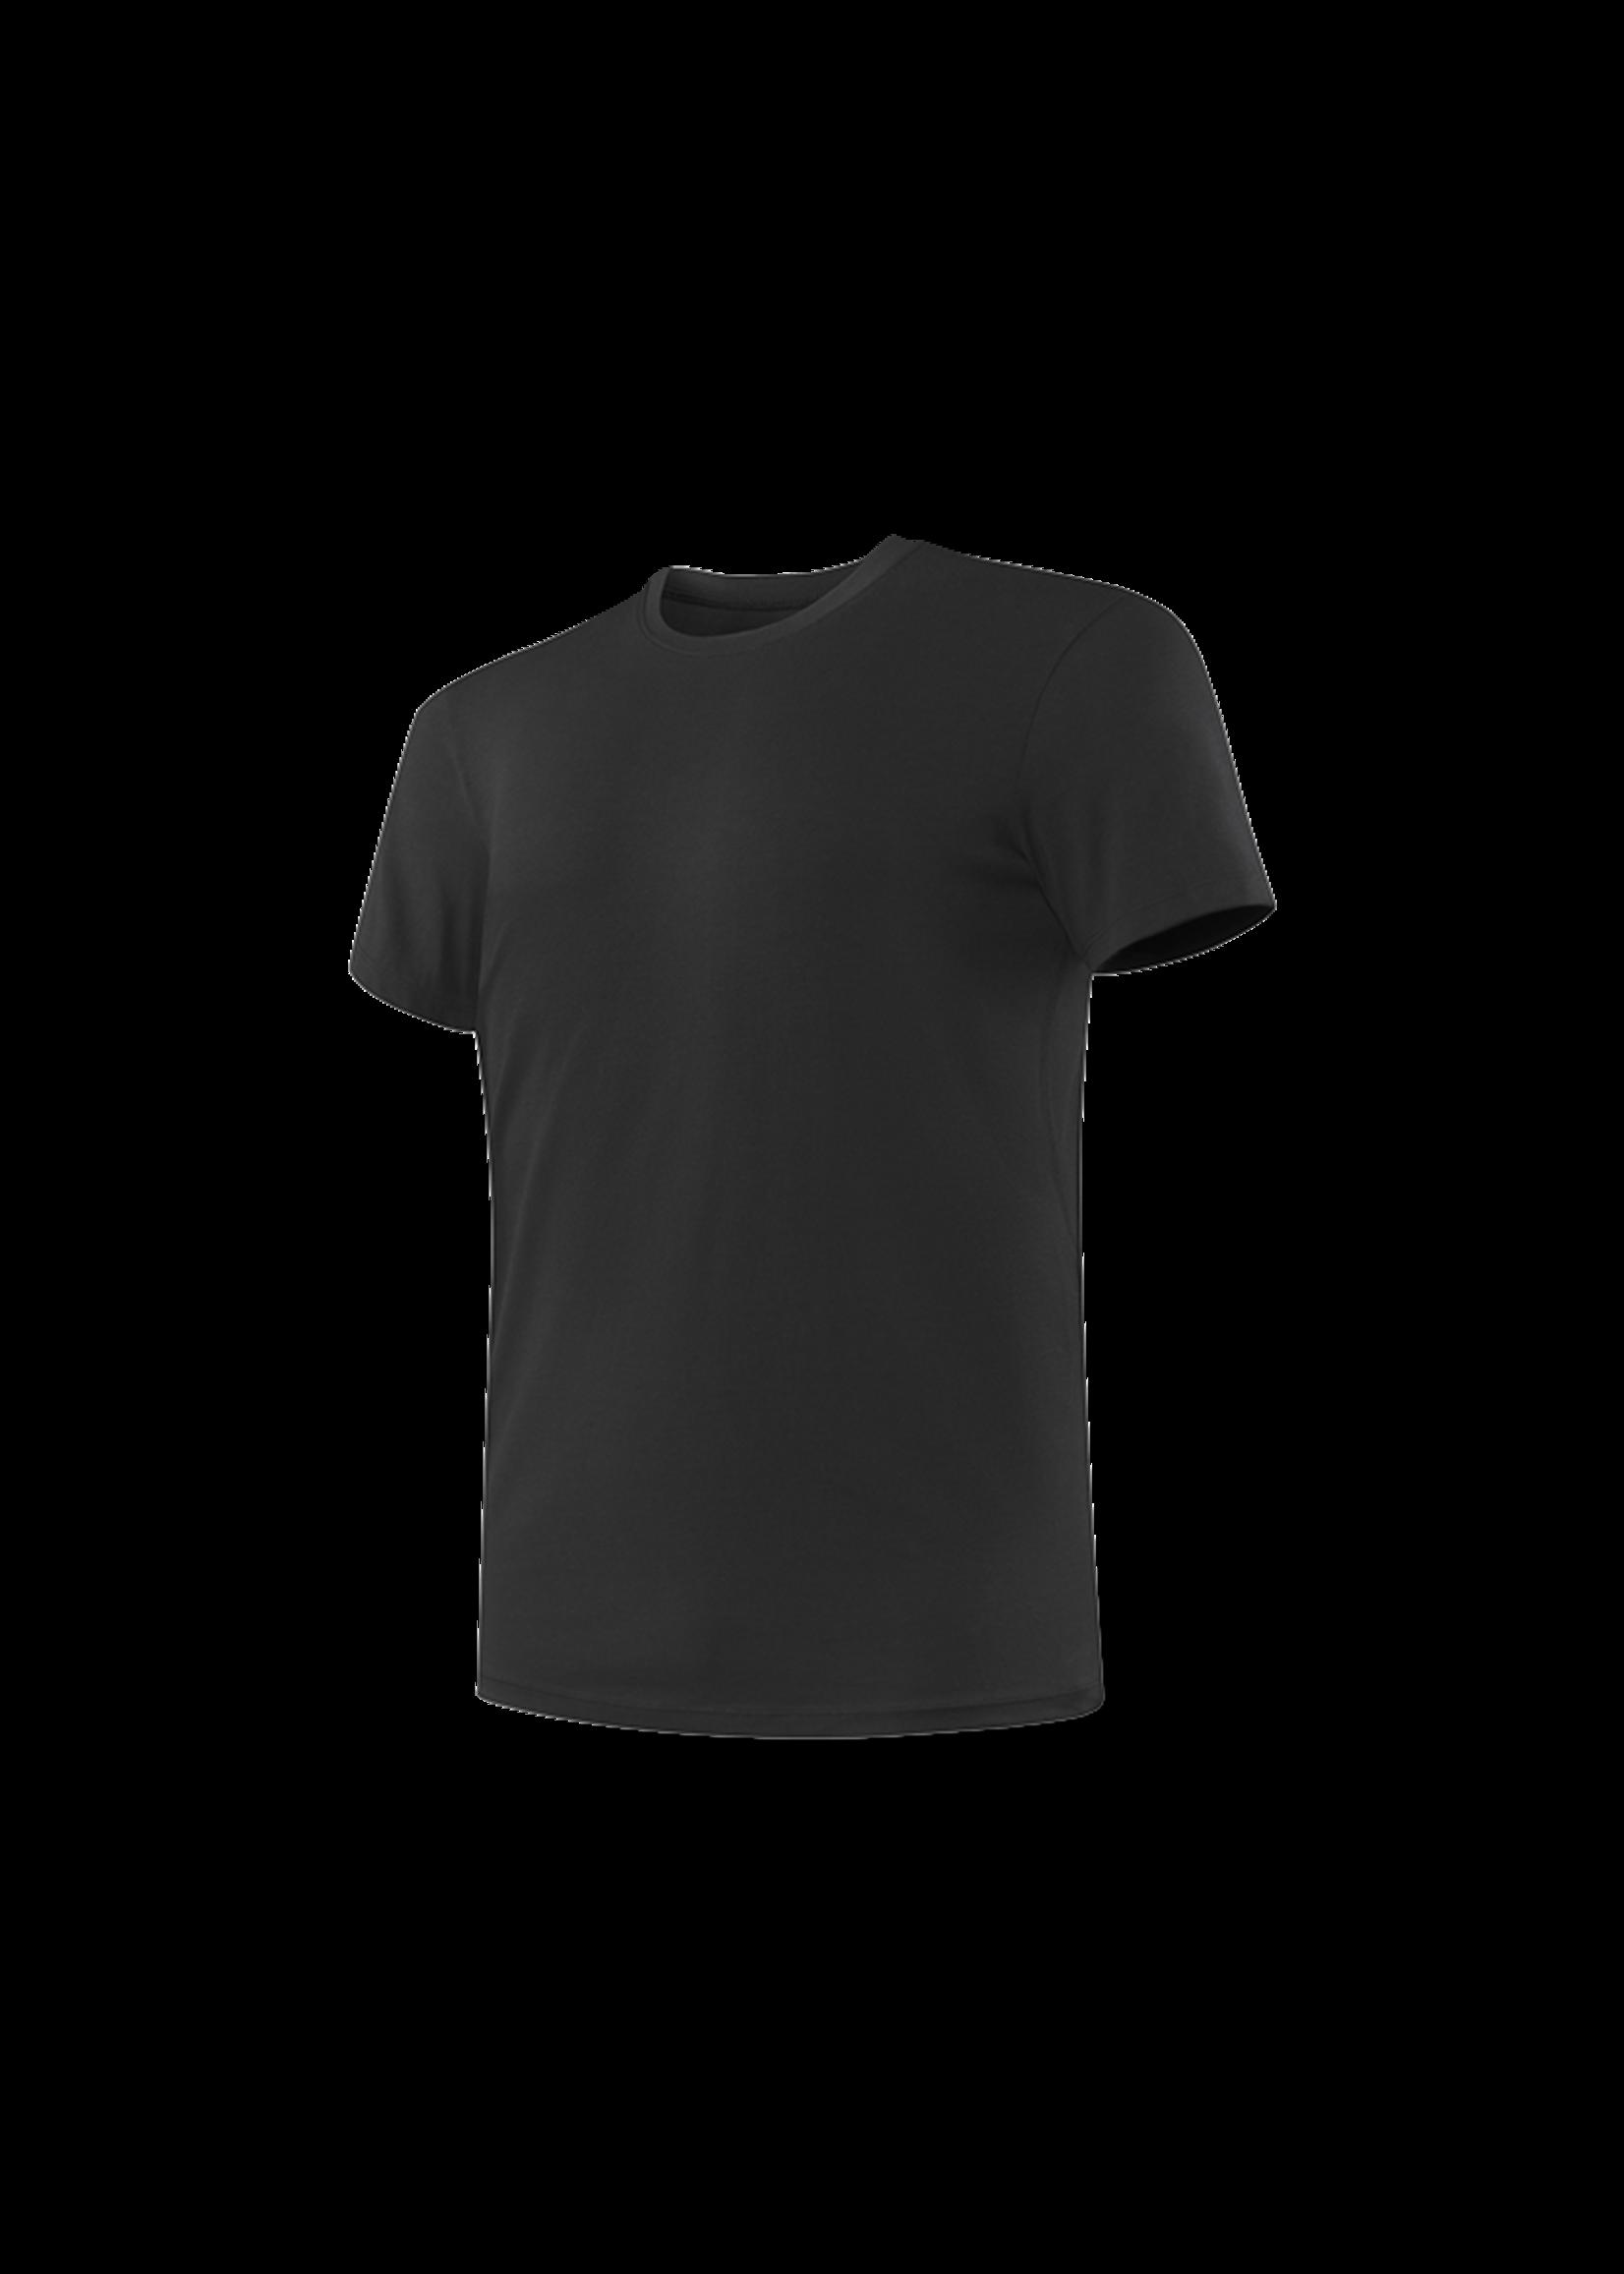 Saxx Undercover Short Sleeve Crew Neck T-shirt